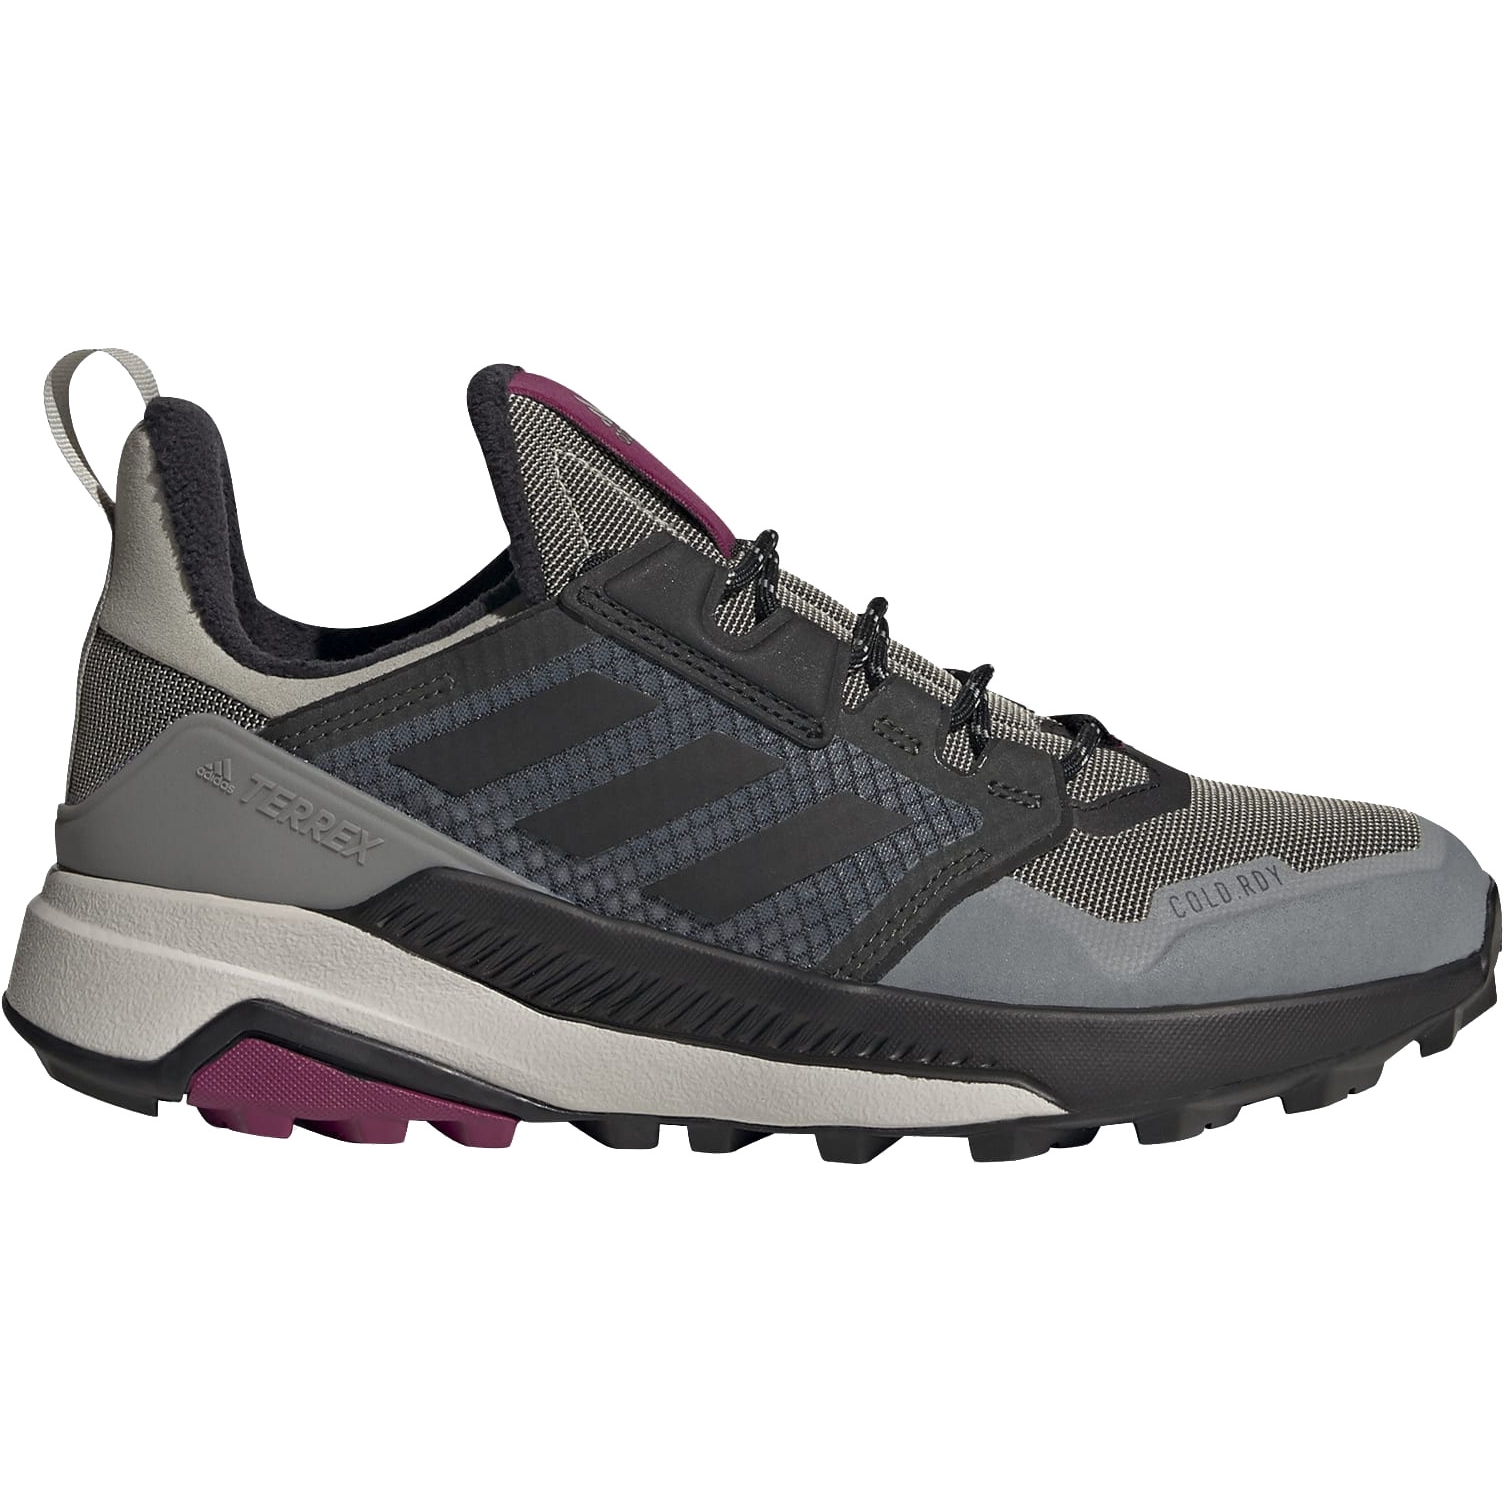 adidas Frauen TERREX Trailmaker COLD.RDY Wanderschuhe - metal grey/core black/power berry FV6918